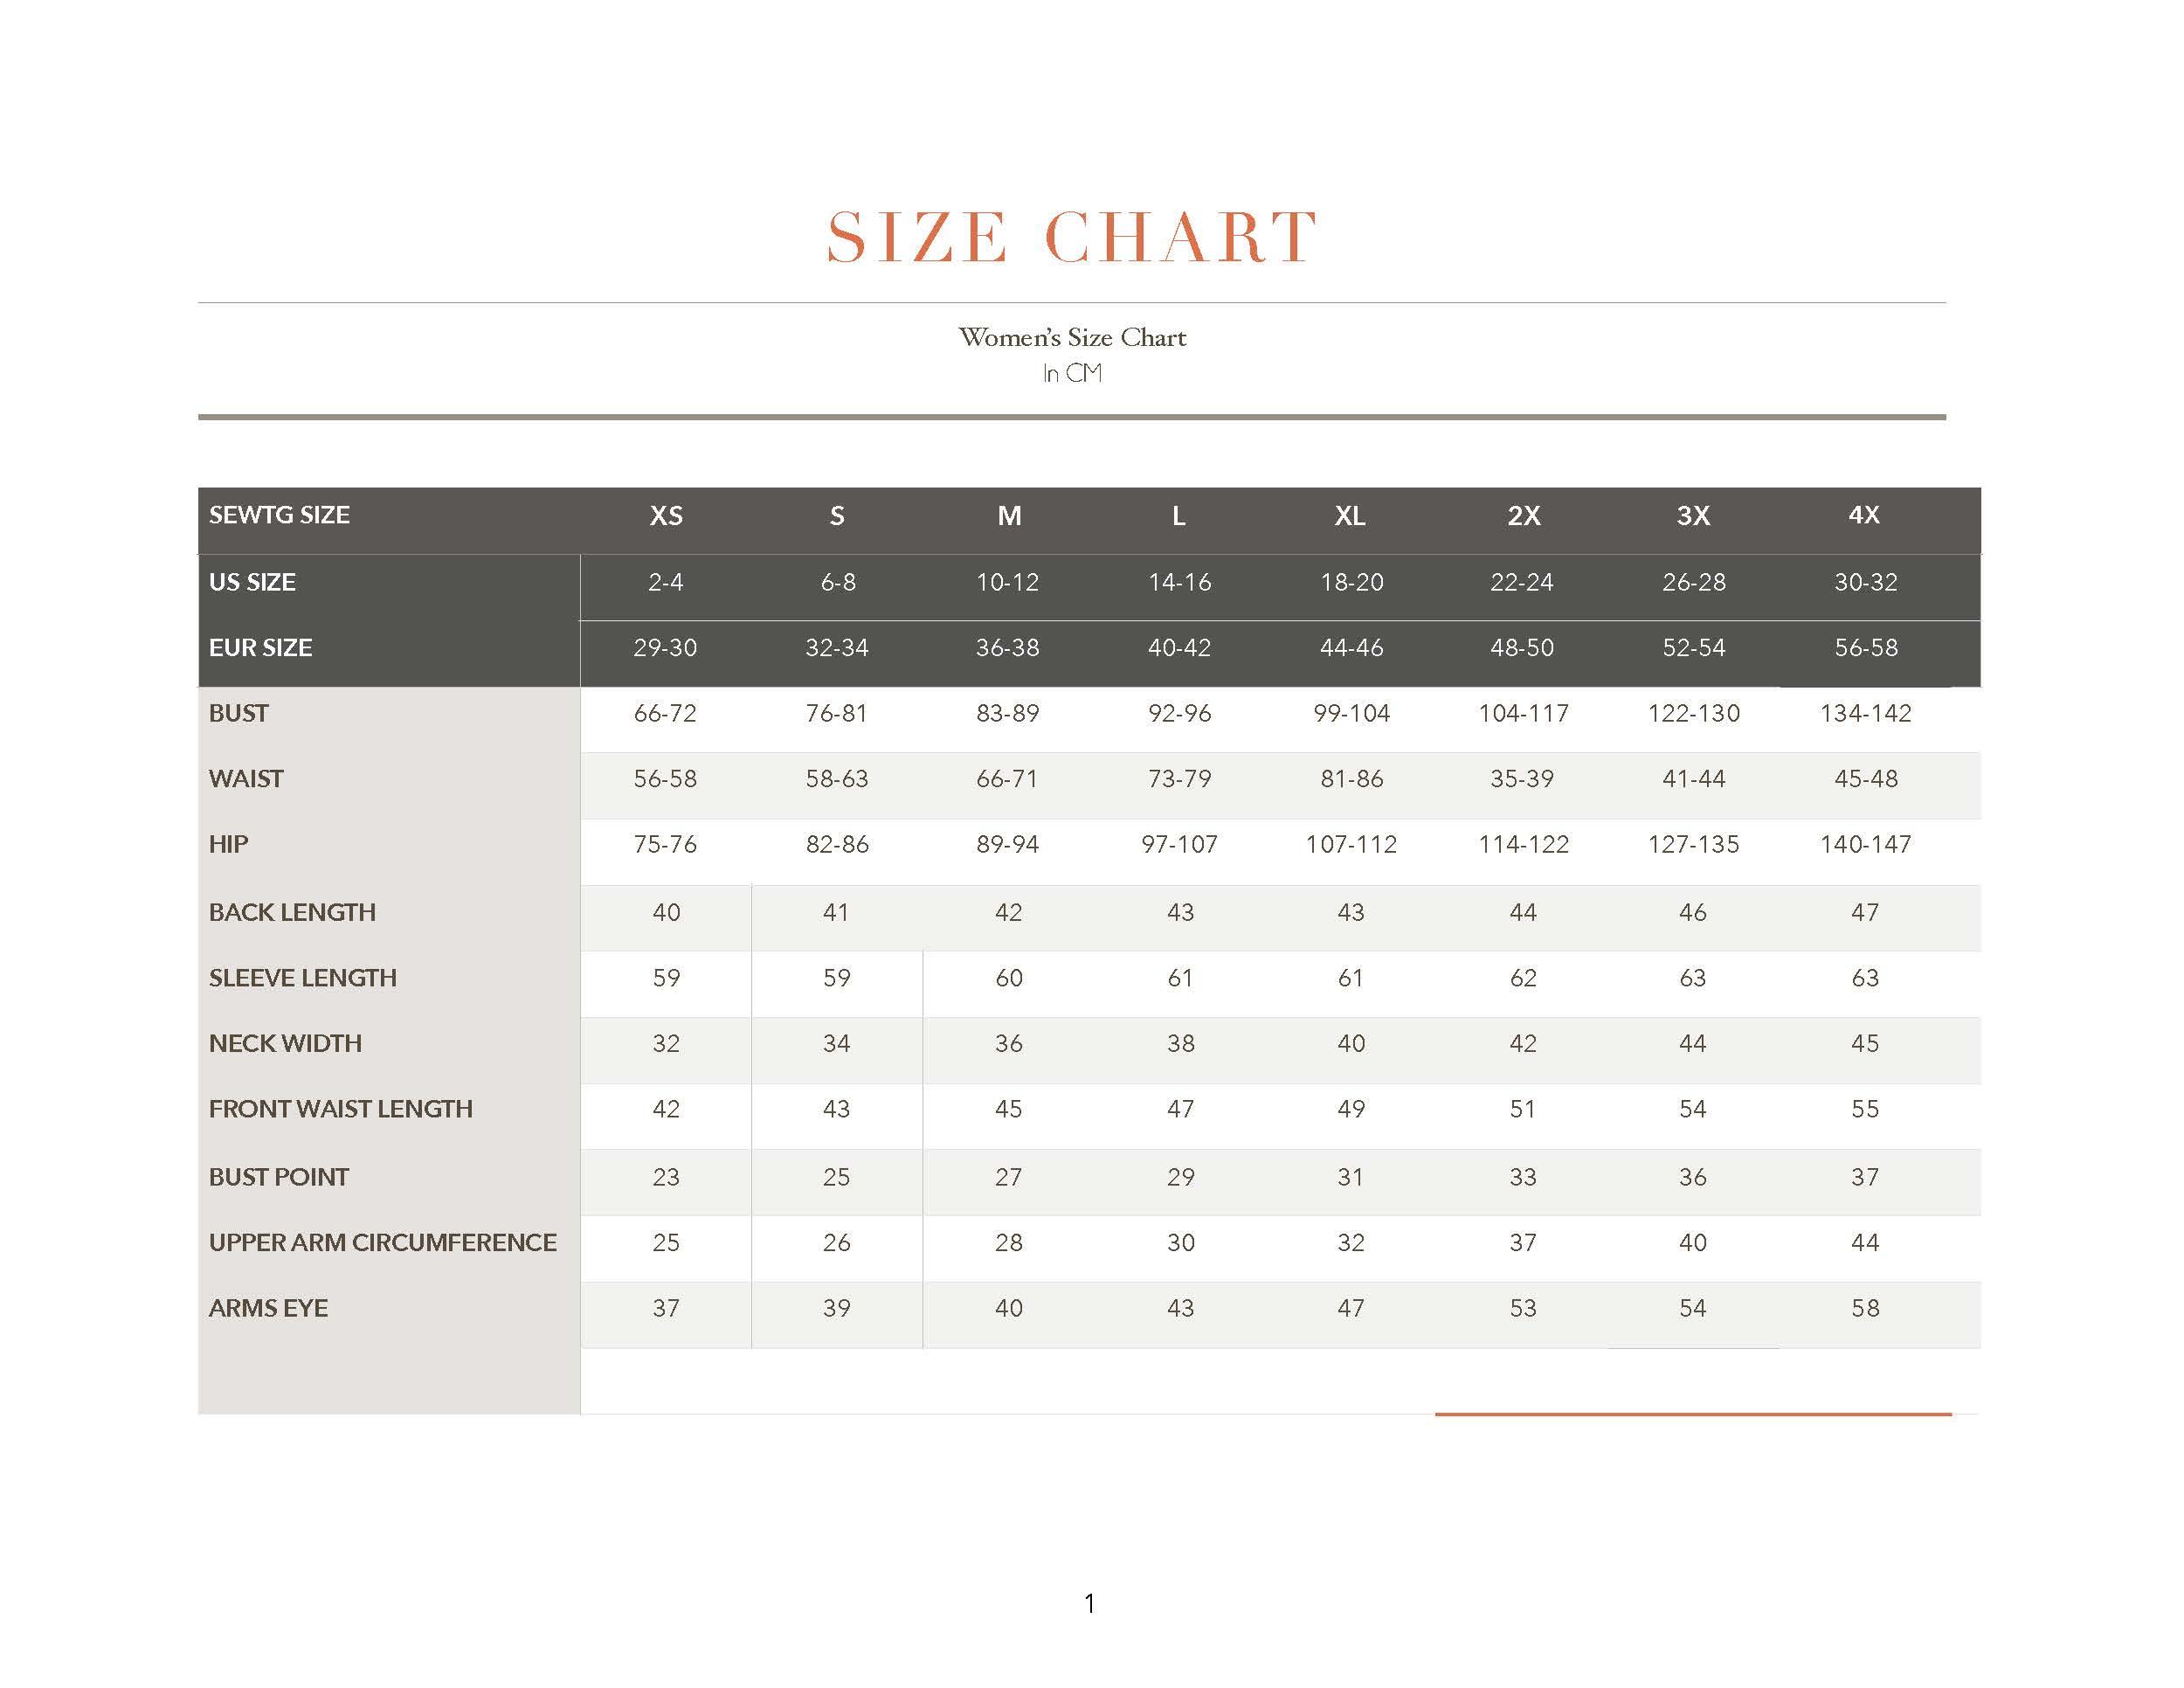 sewtg-size-chart-cm-page-1.jpg